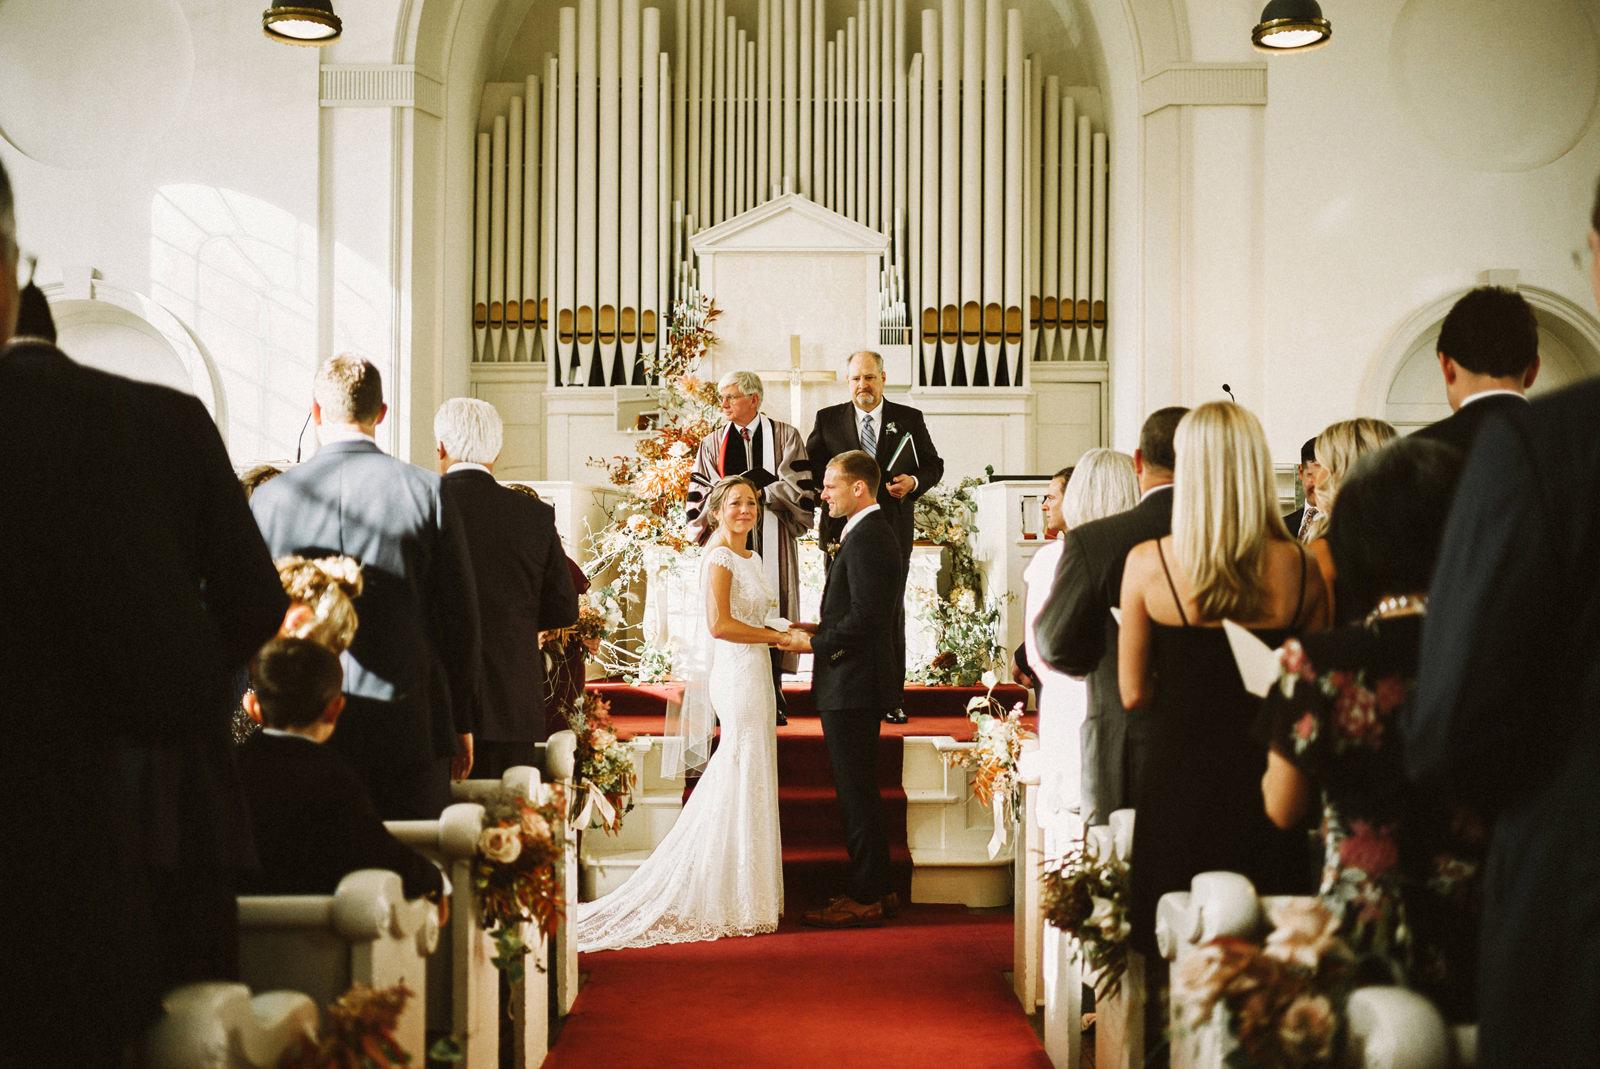 bridgeport-wedding-059 BRIDGEPORT, CONNECTICUT BACKYARD WEDDING